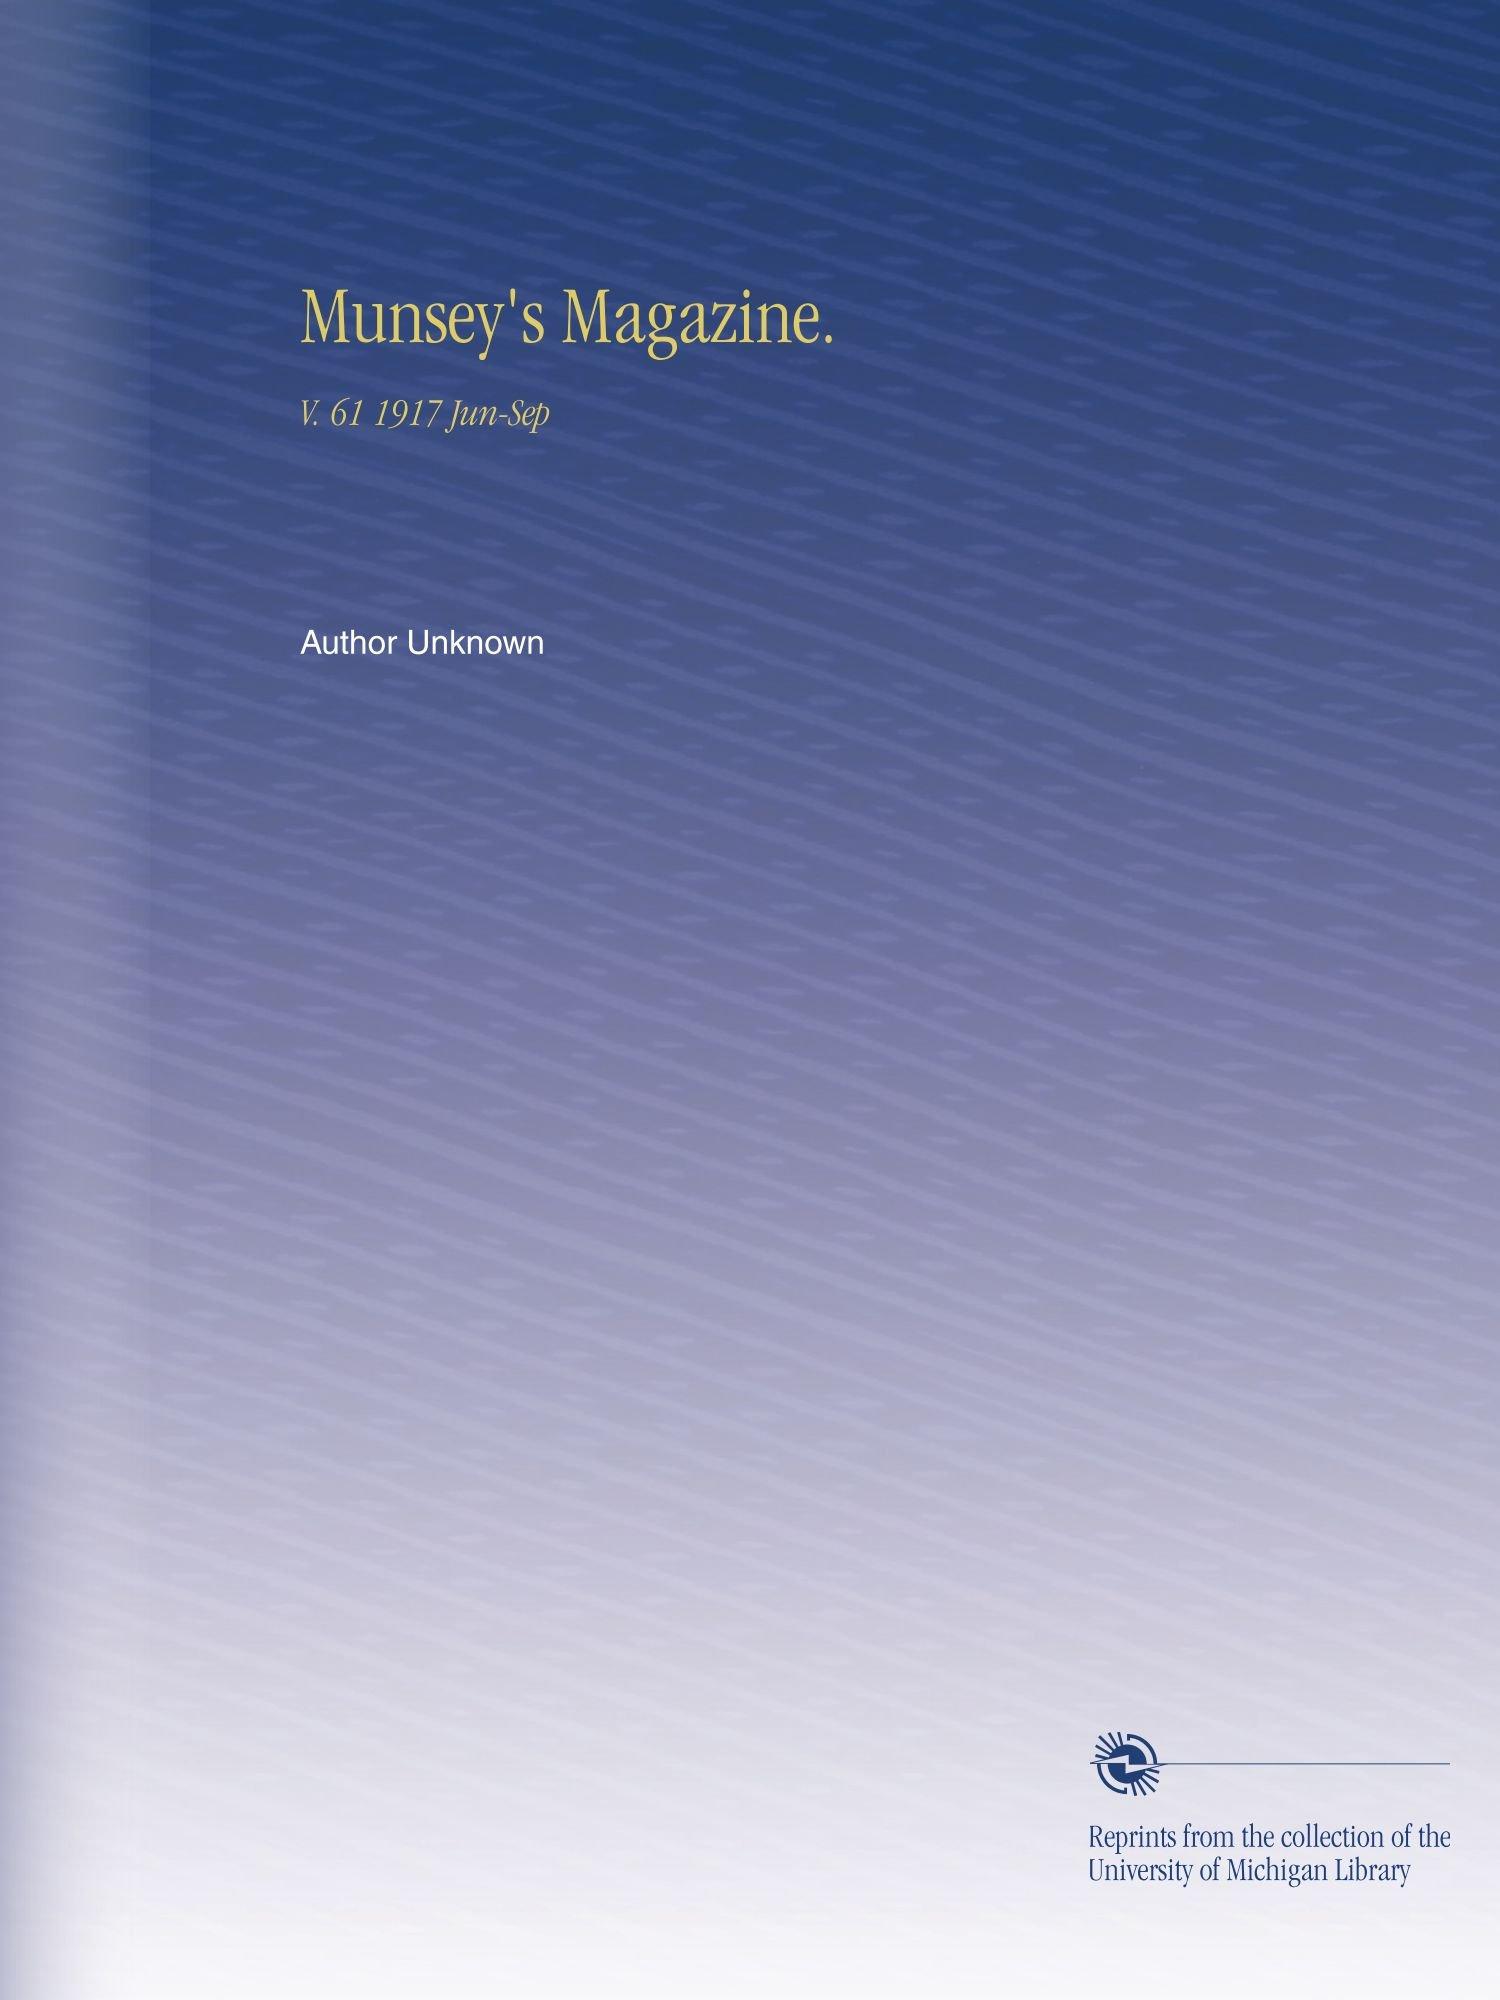 Munsey's Magazine.: V. 61 1917 Jun-Sep pdf